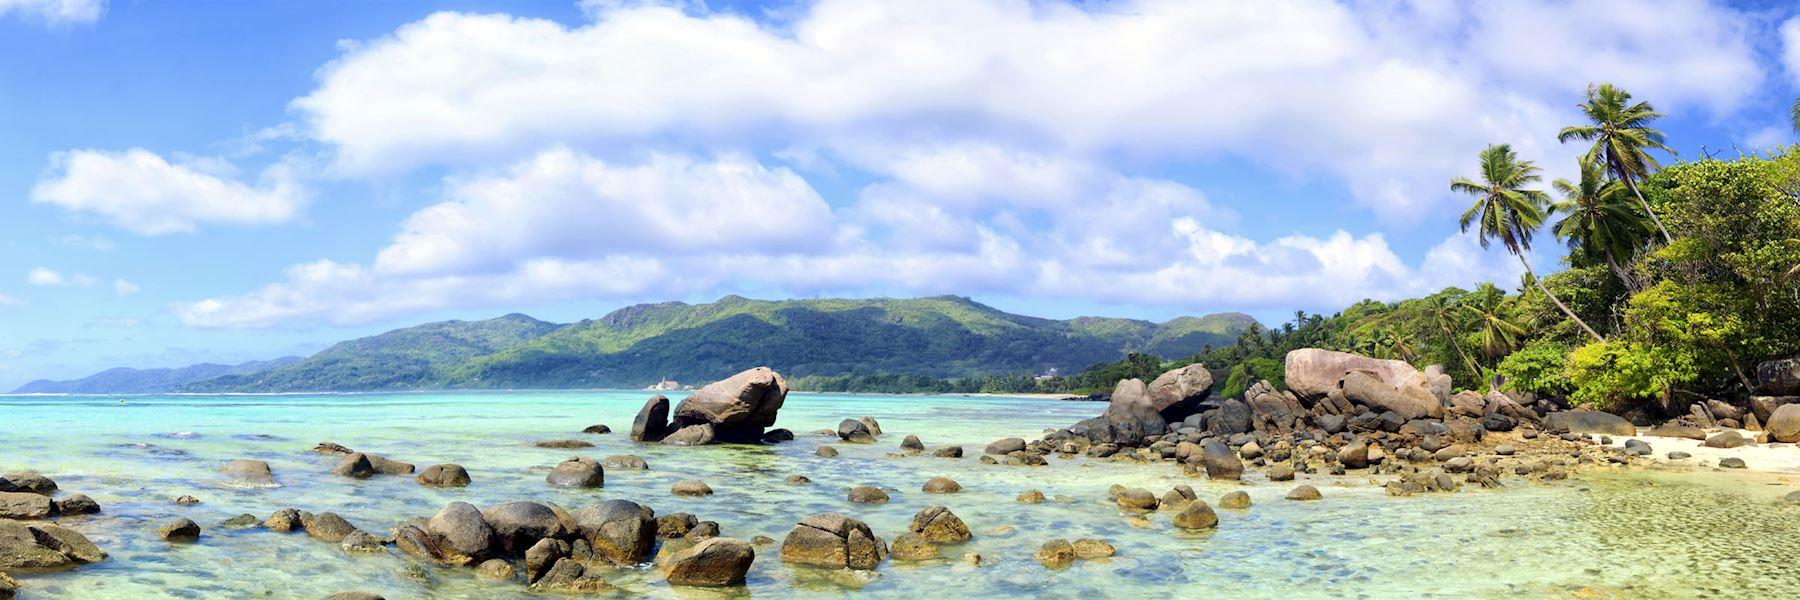 Visit Mahé Island, Seychelles